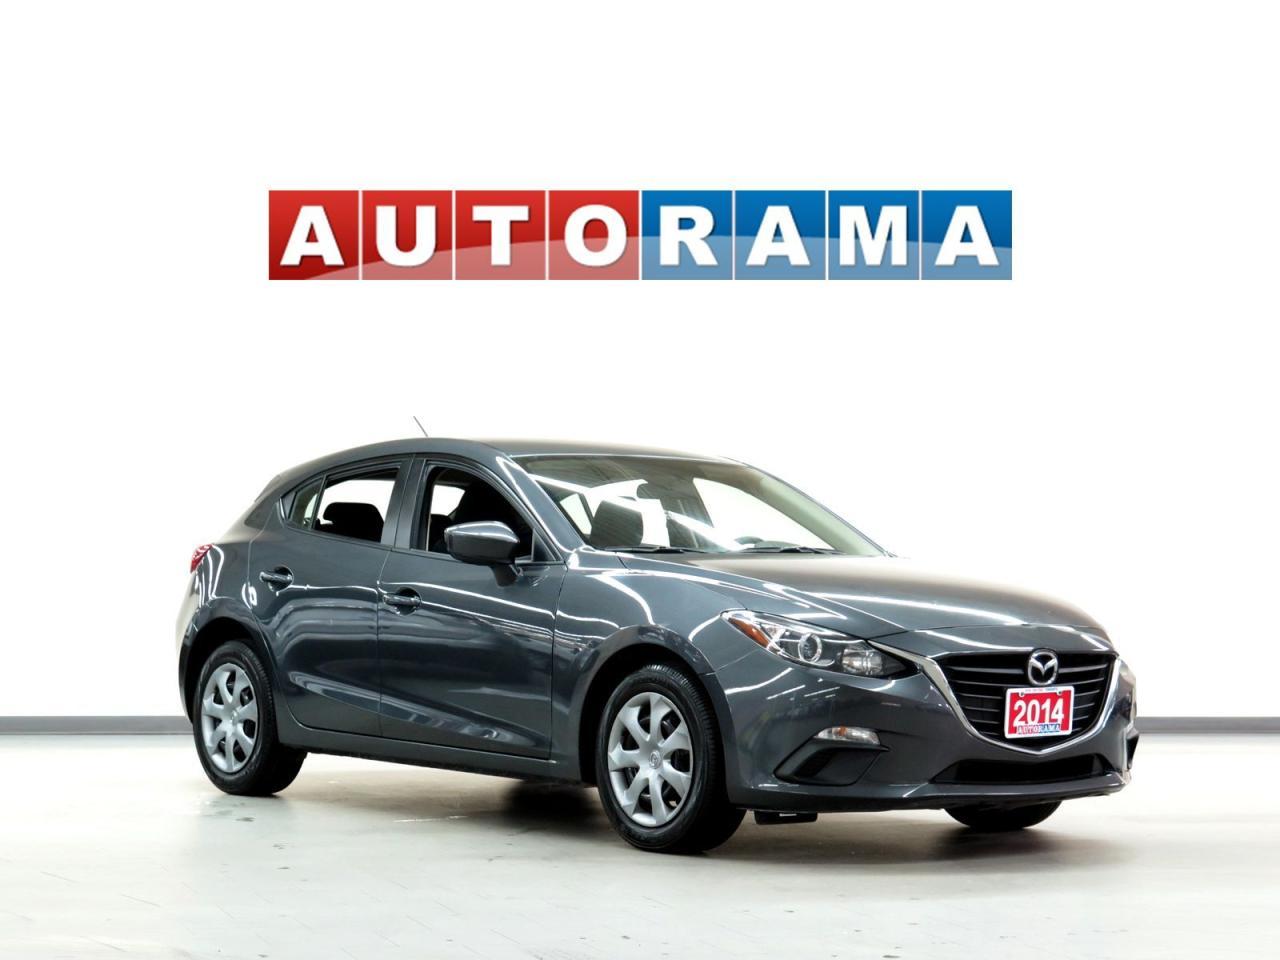 2014 Mazda MAZDA3 HATCHBACK SUNROOF ALLOY WHEELS VIN:  JM1BM1L78E1151729Listing ID: 2849086 Print Icon